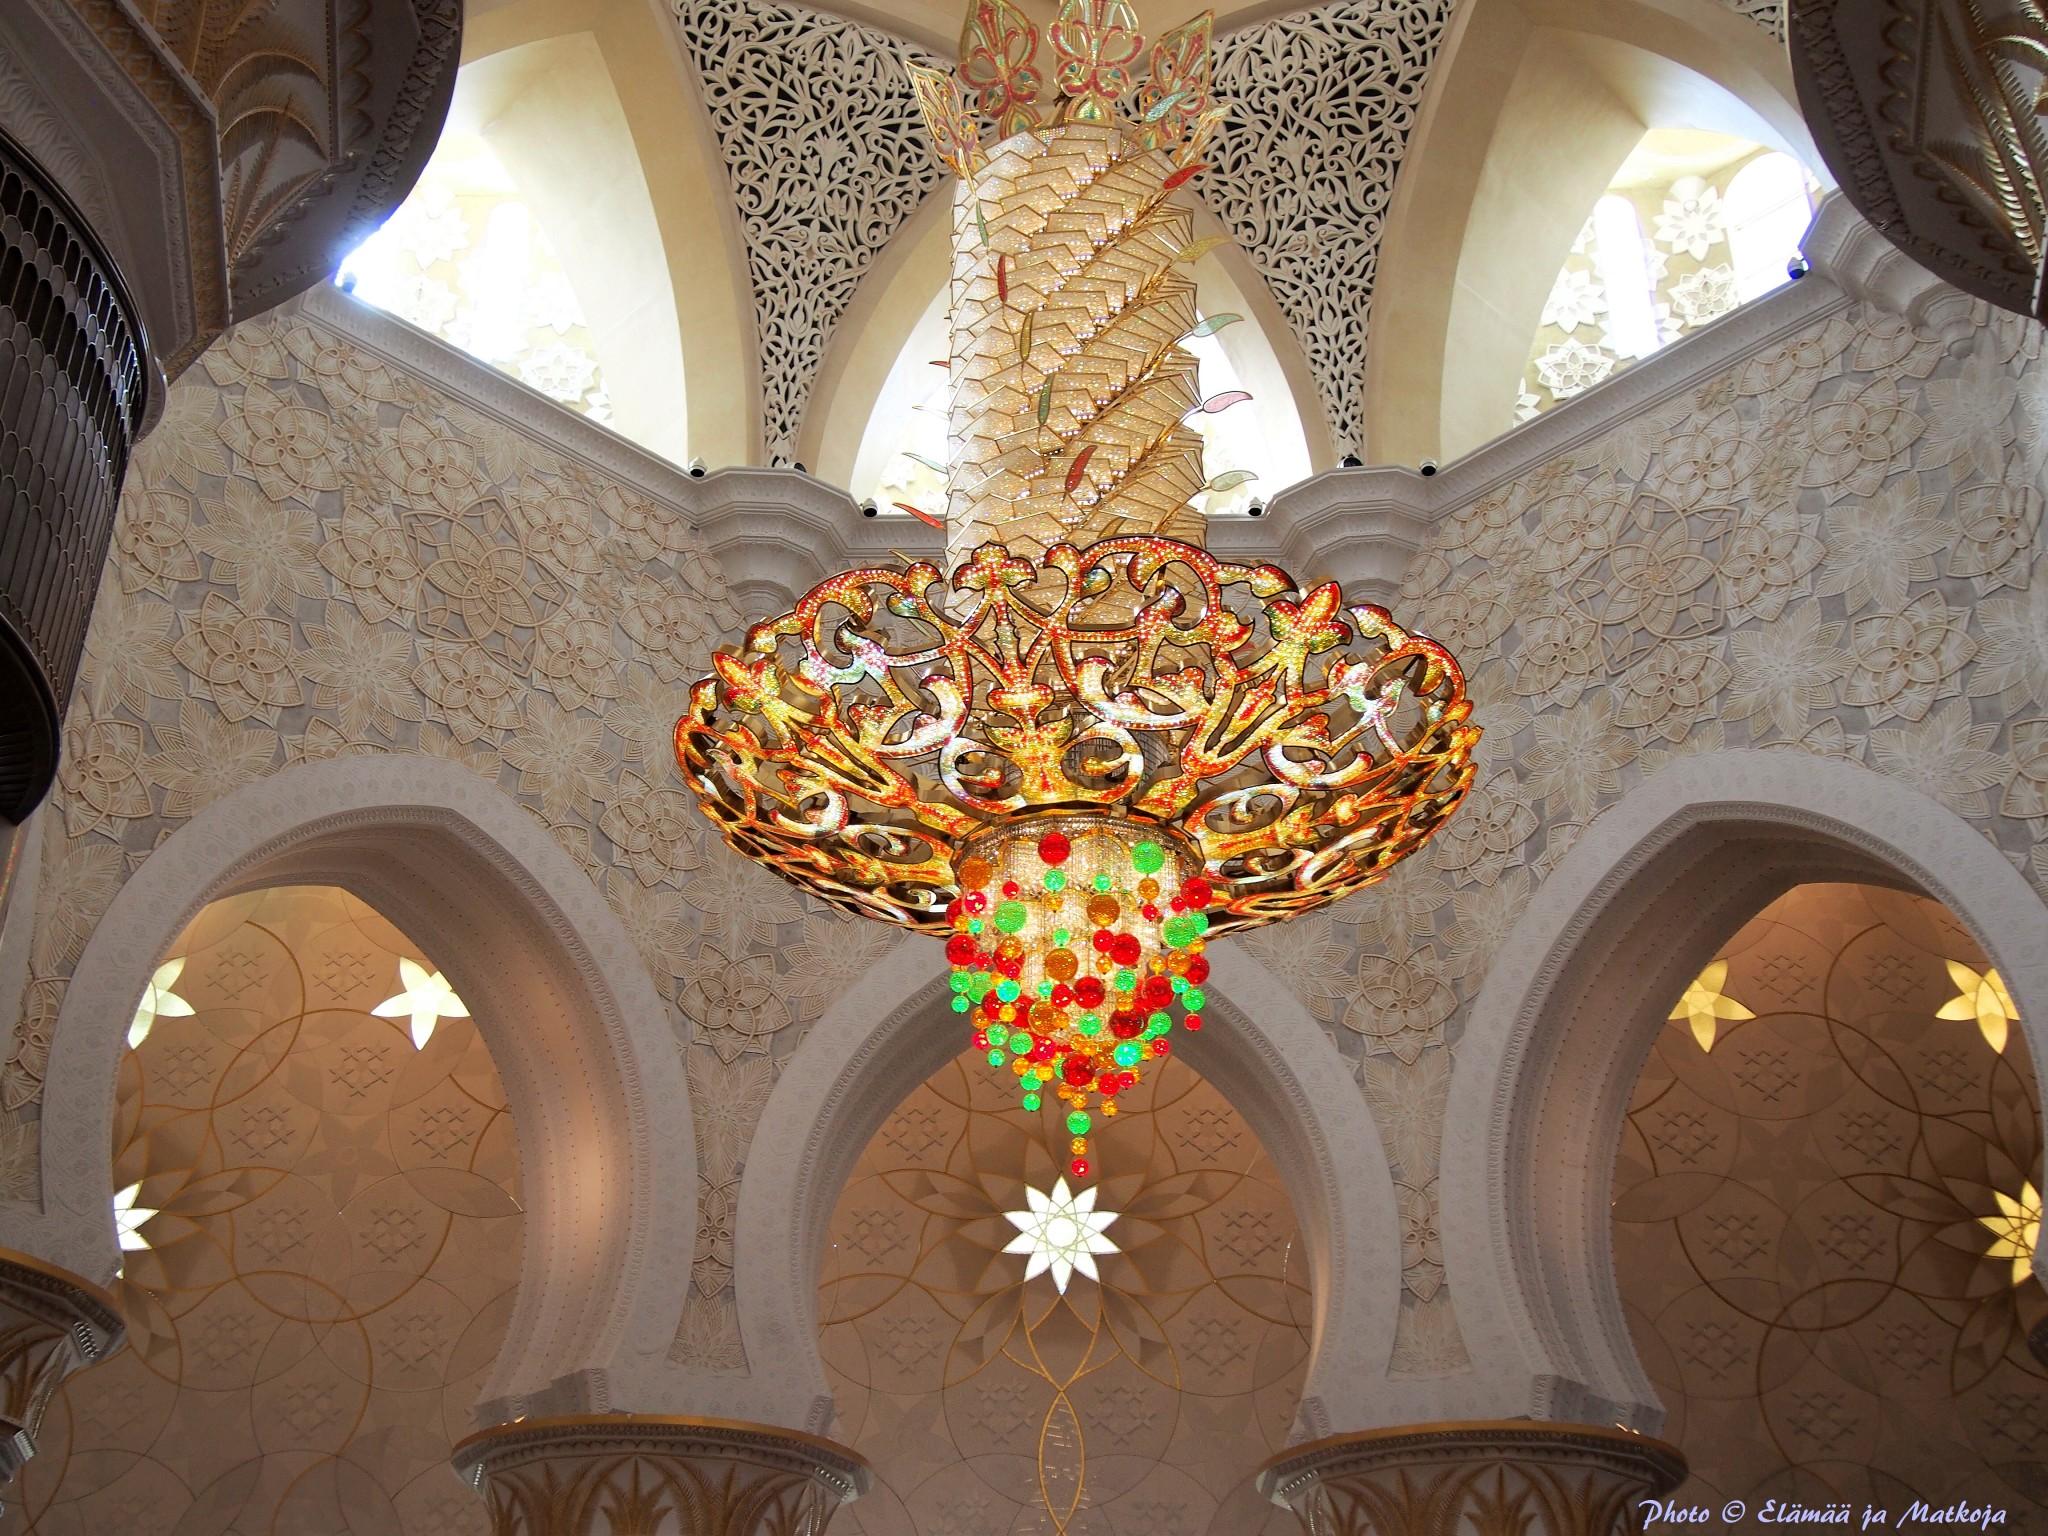 Sheikh Zayed Grand Mosque Abu Dhabi UAE 14 Photo © Elämää ja Matkoja